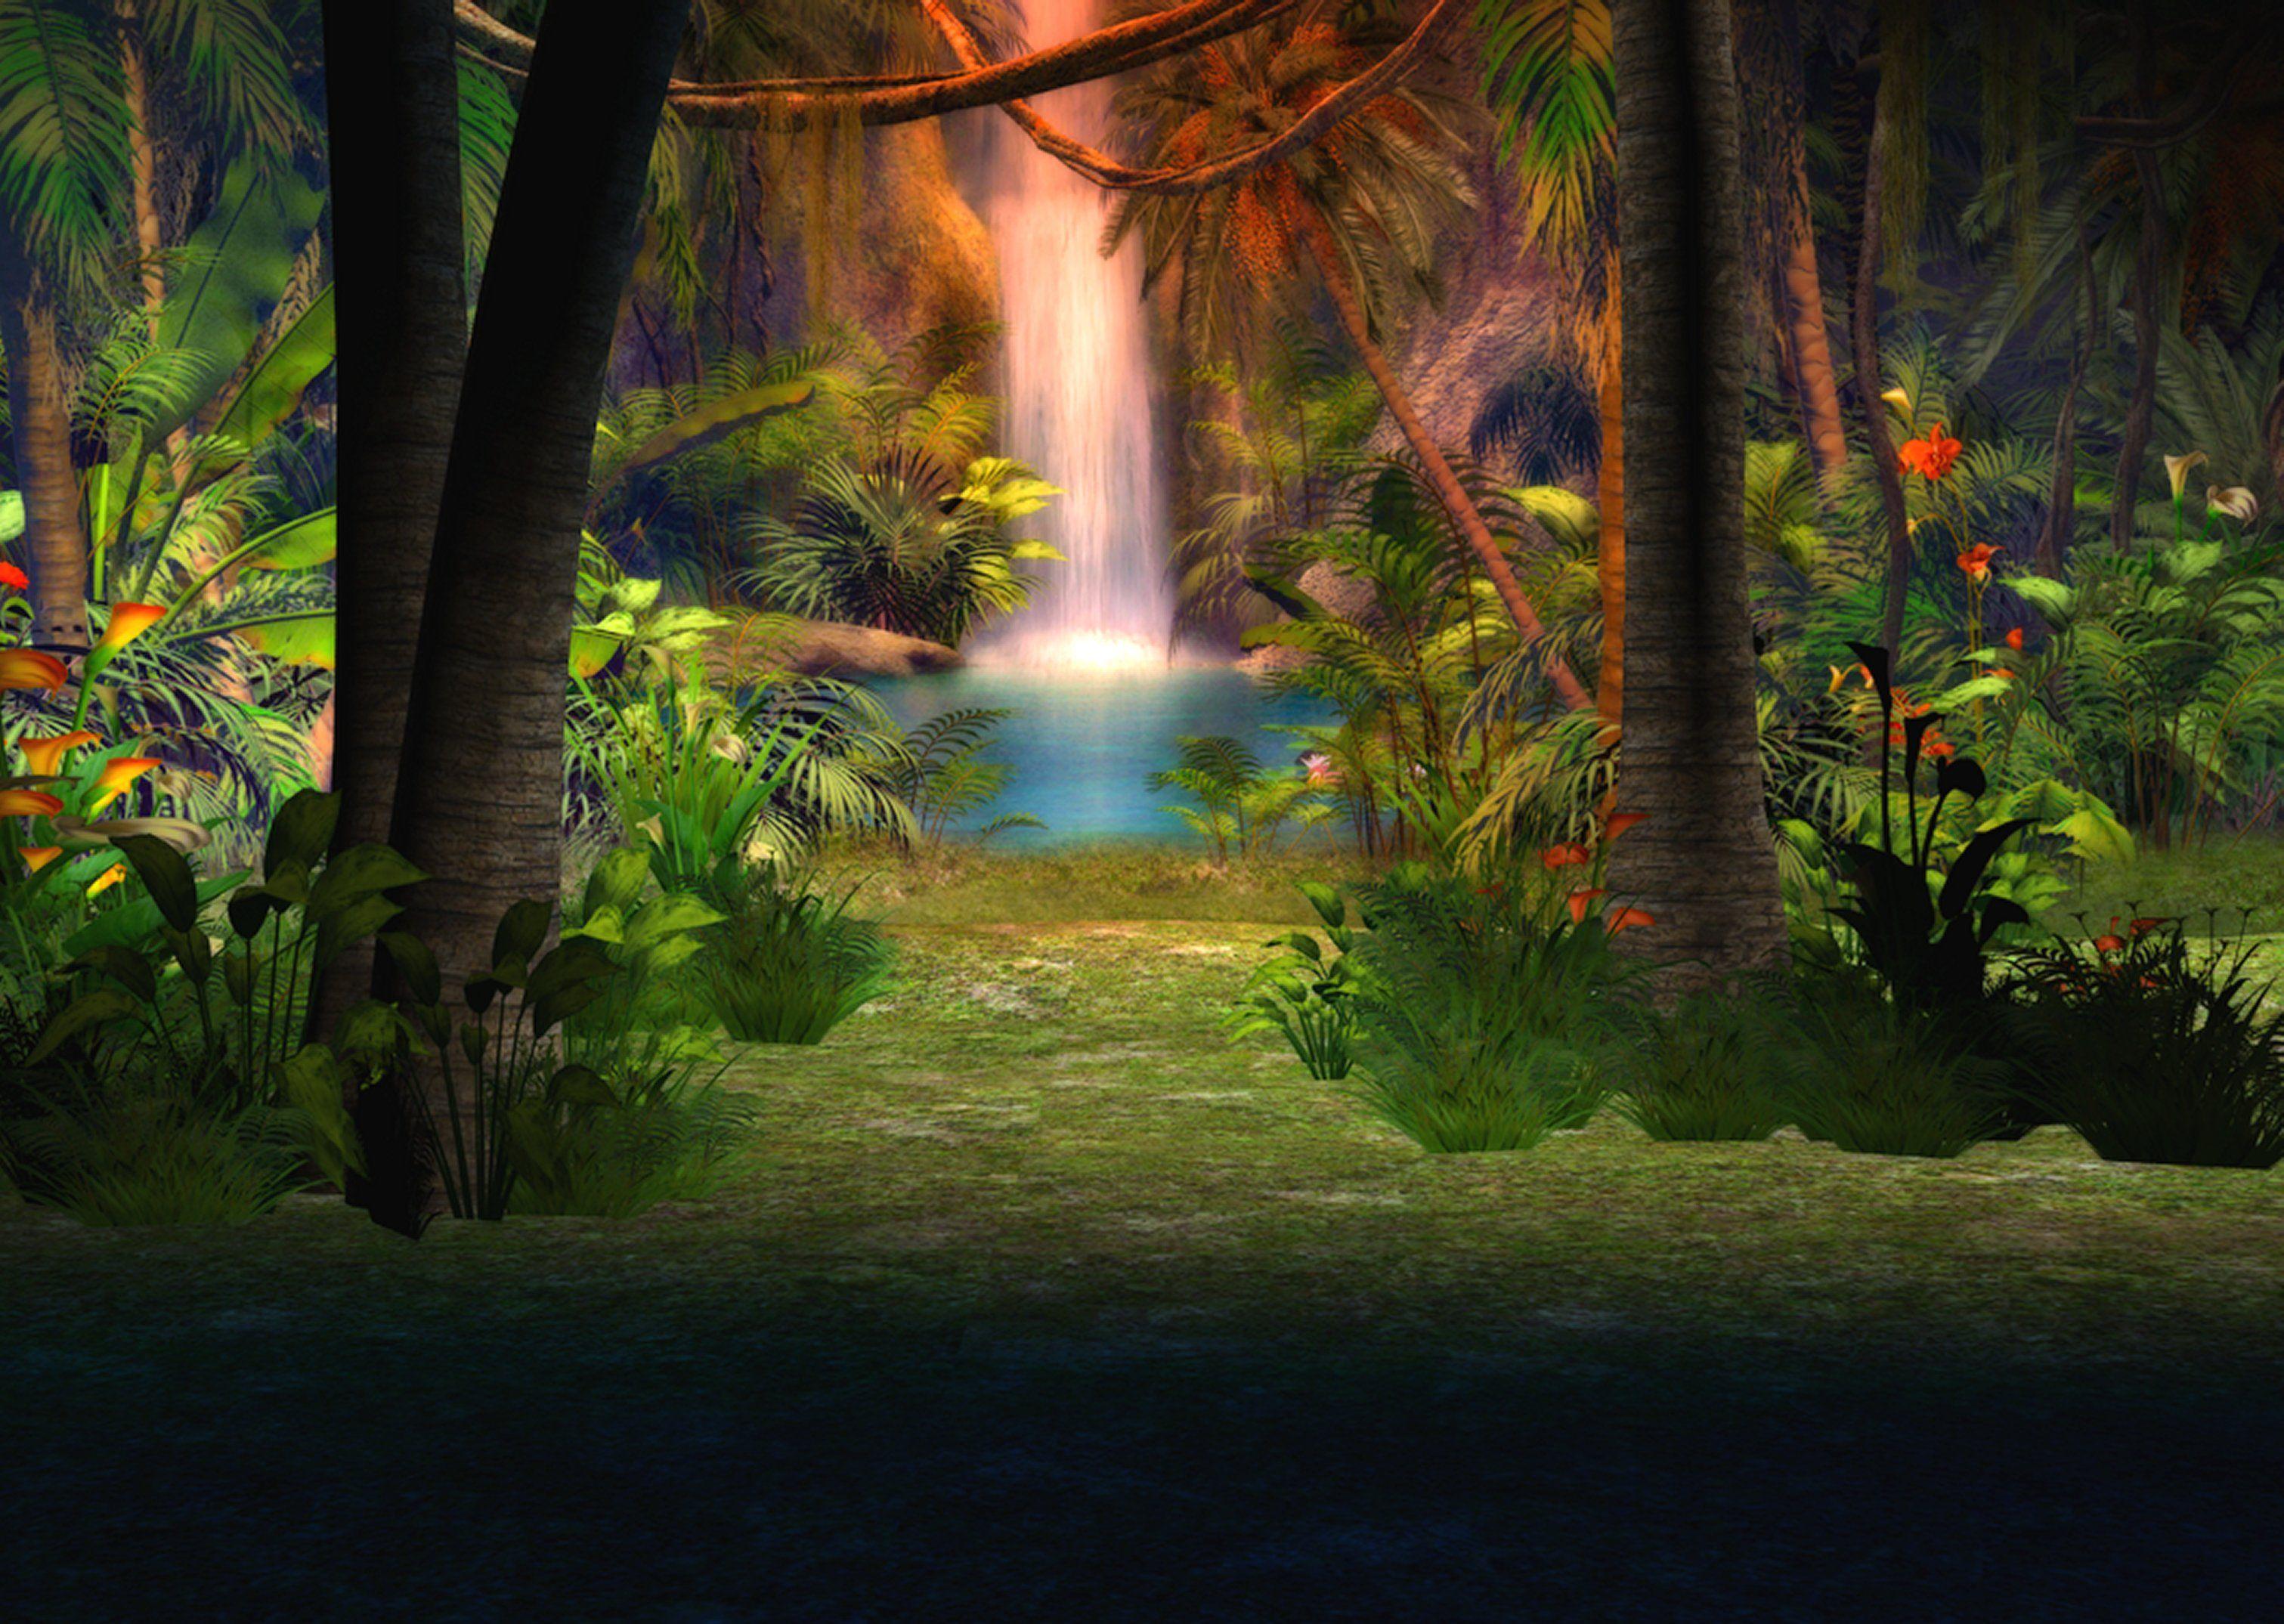 Jungle Waterfall Wallpaper Hd: Jungle Background By ~Lil-Mz On DeviantART